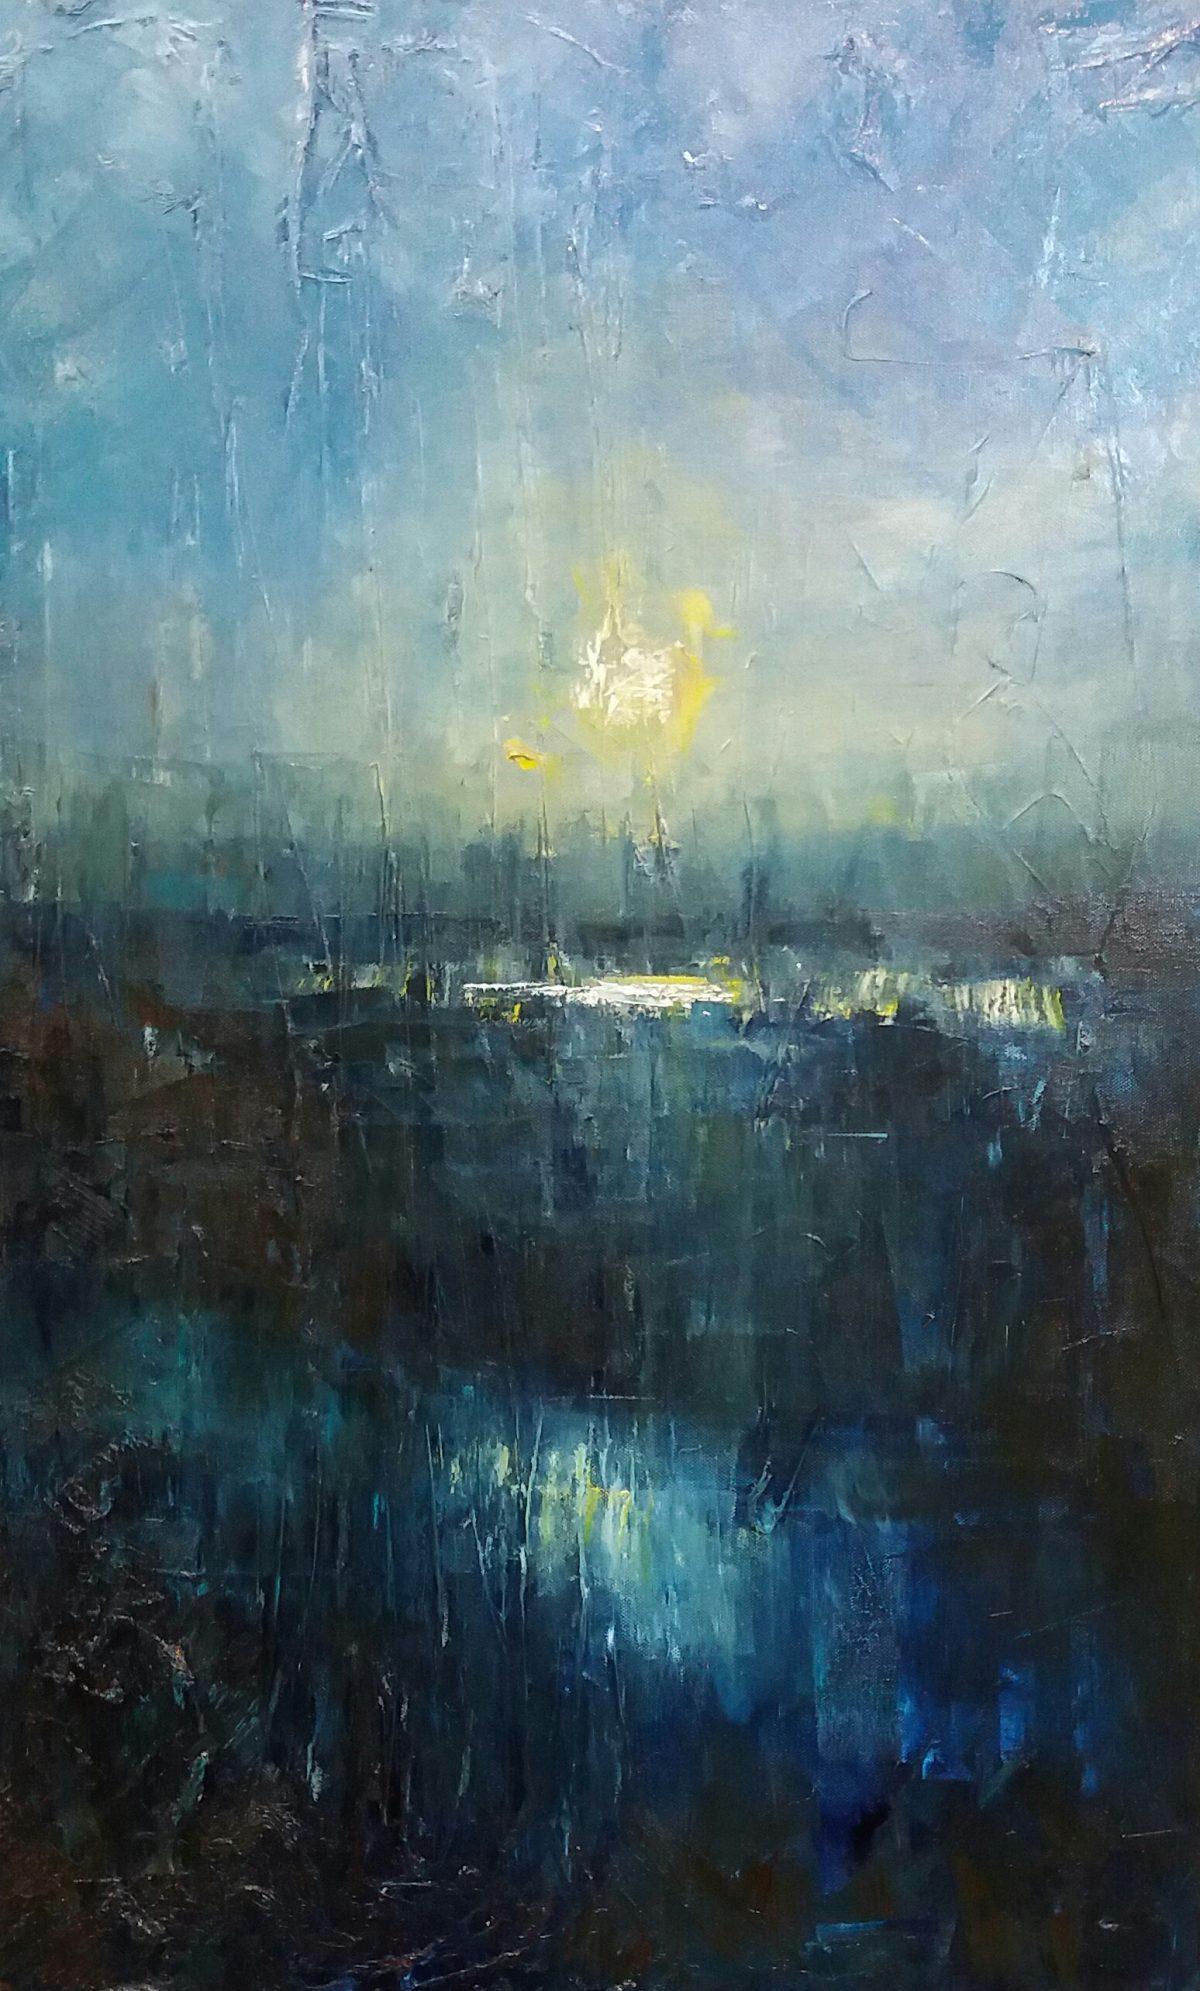 Abstract marsh. Oil on Canvas. 5080cm. Geldeston Landscape Painting. Waveney Valley. Artist.